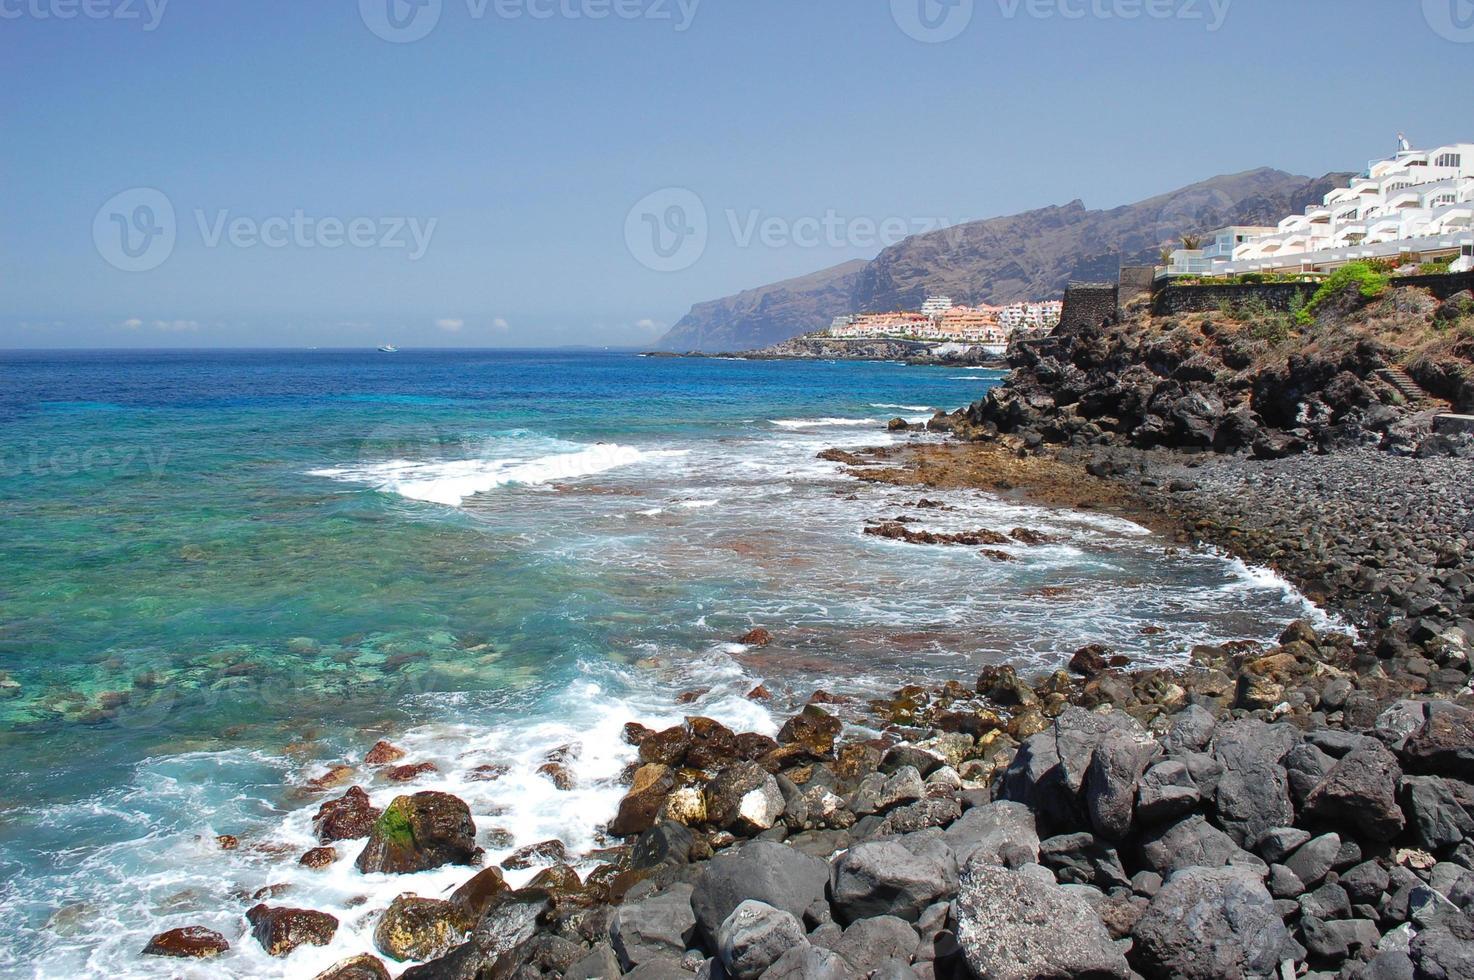 natursköna kustlandskap i Puerto de santiago, tenerife, Spanien foto